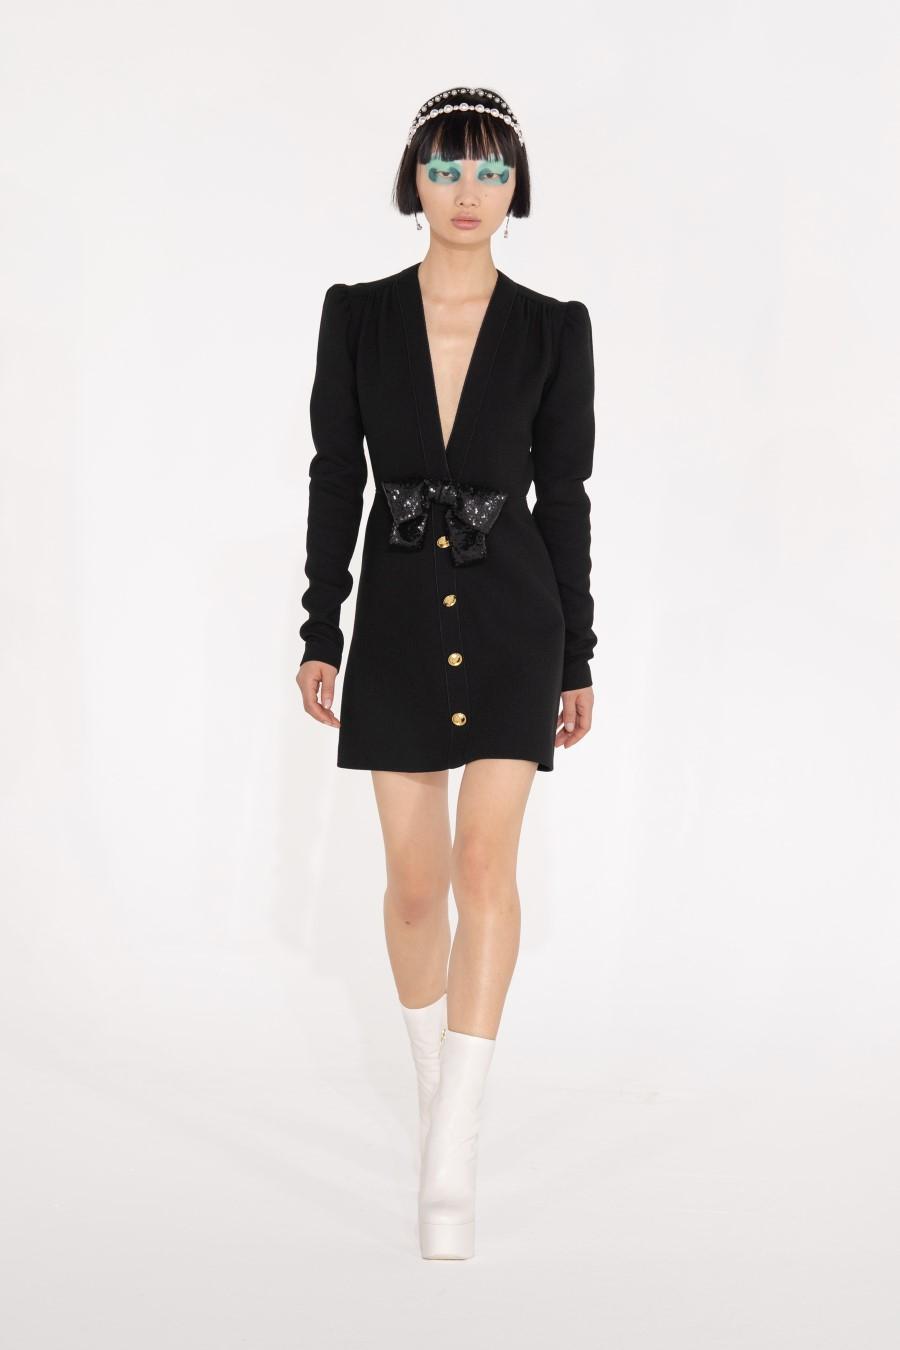 Giambattista Valli Fall Winter 2021 - Paris Fashion Week